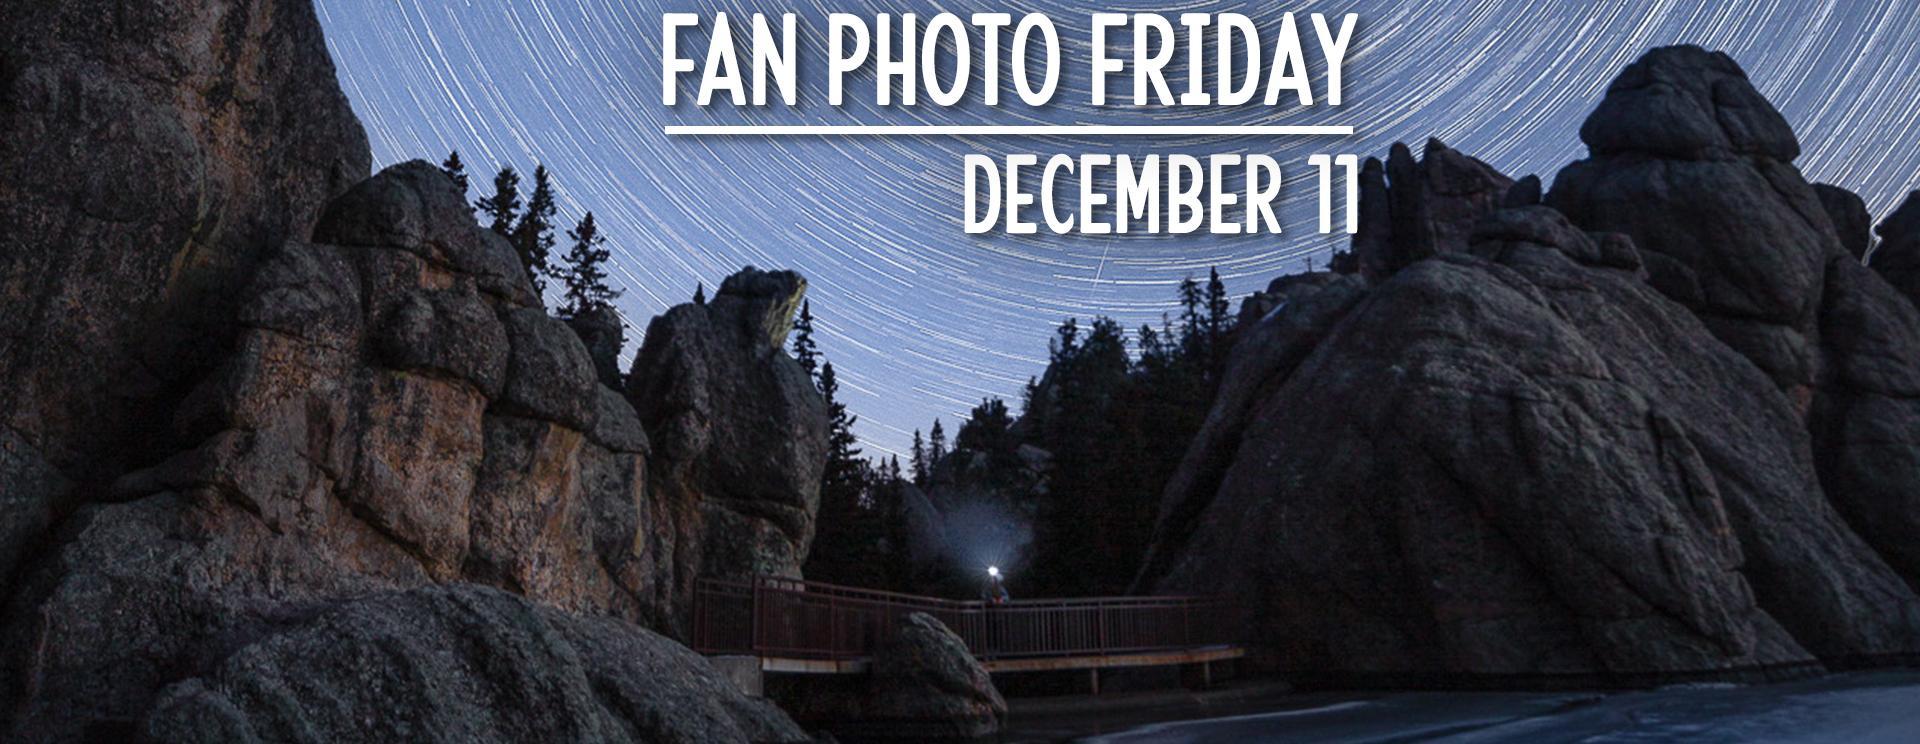 Fan Photo Friday   December 11, 2020